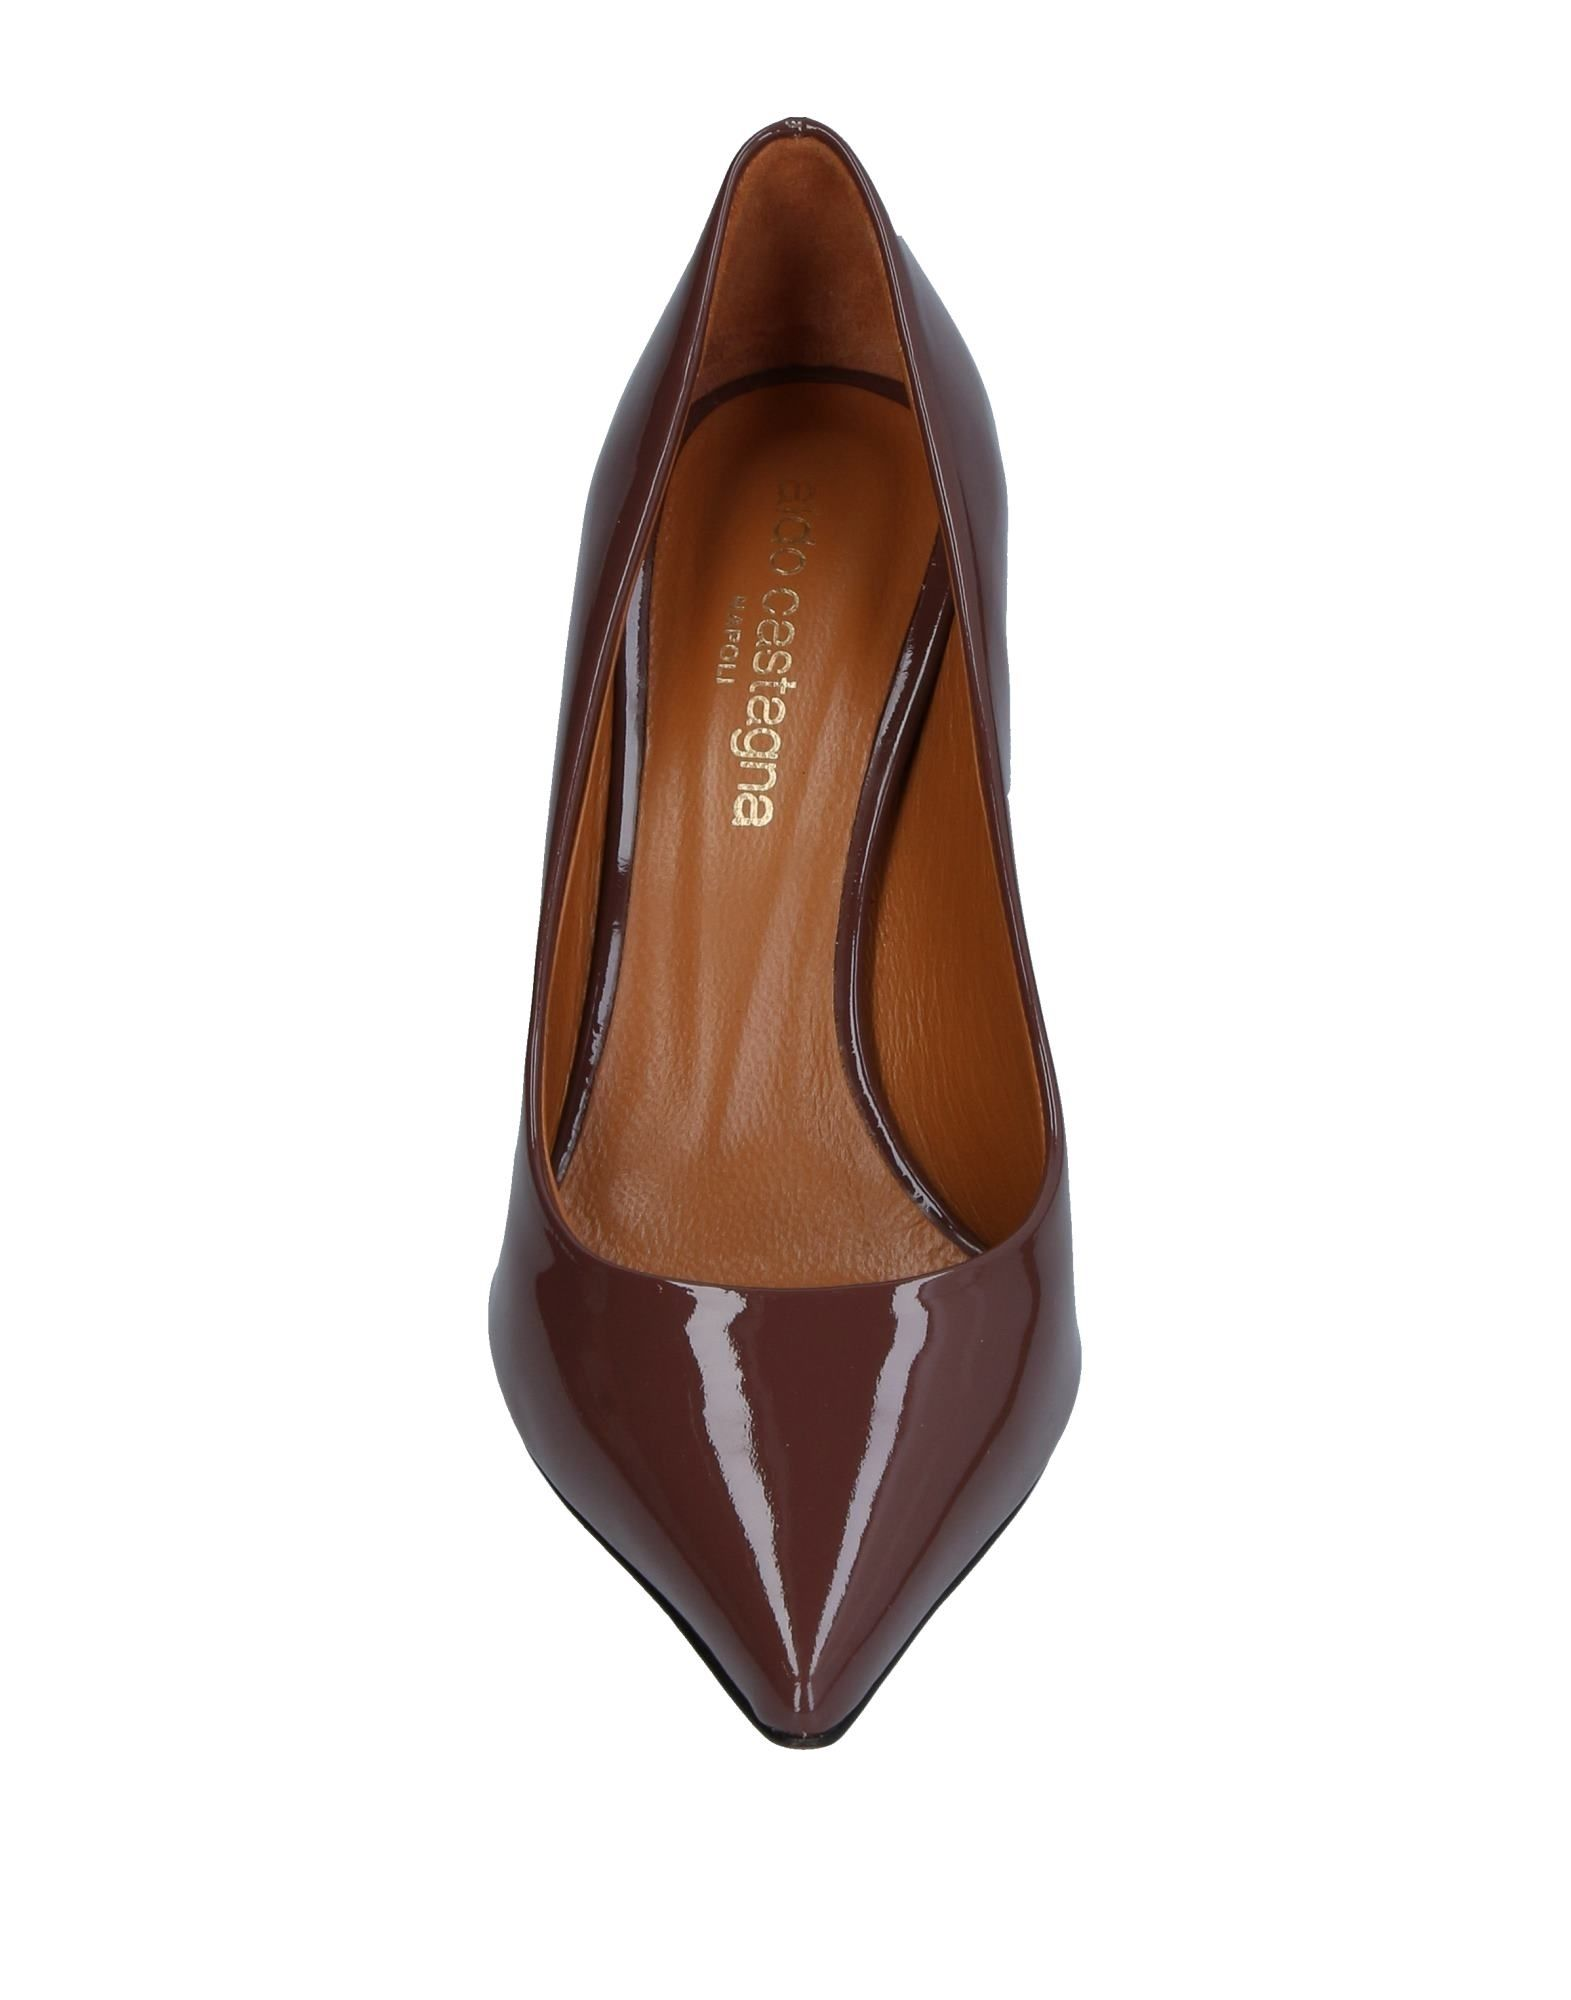 Stilvolle billige billige billige Schuhe Aldo Castagna Pumps Damen  11306032OK 96eb56